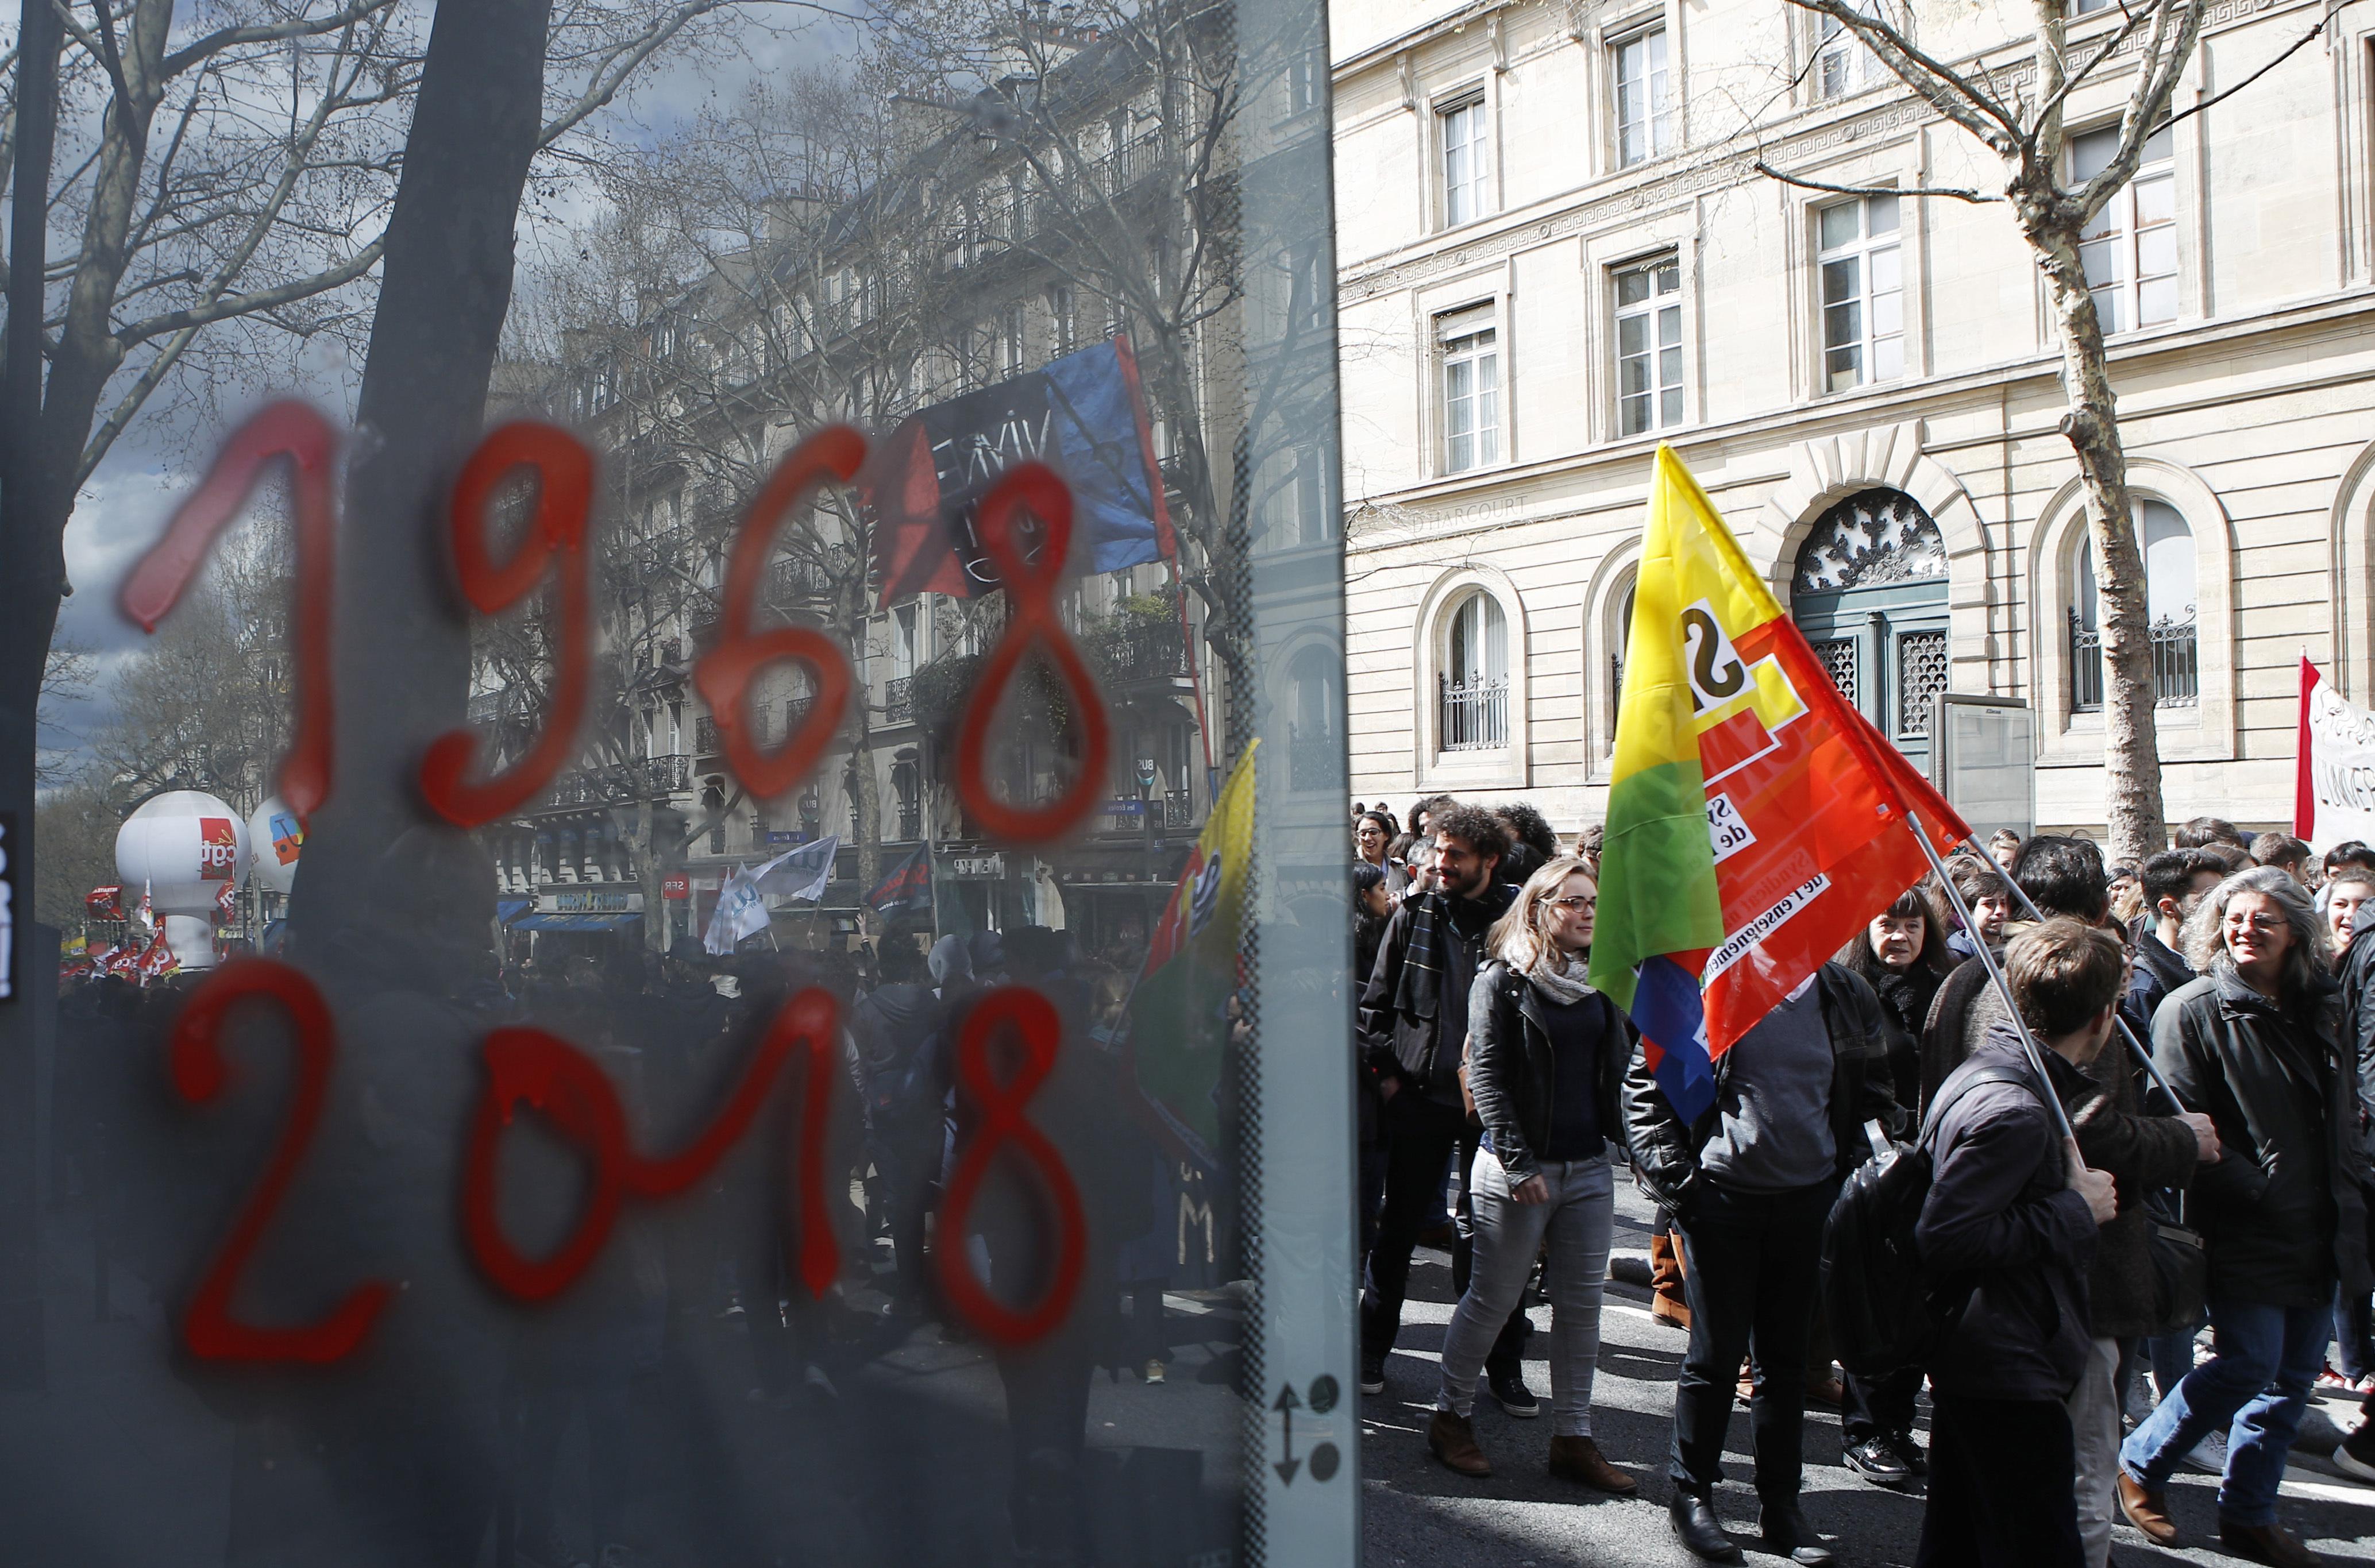 (AP Photo/Francois Mori, File)